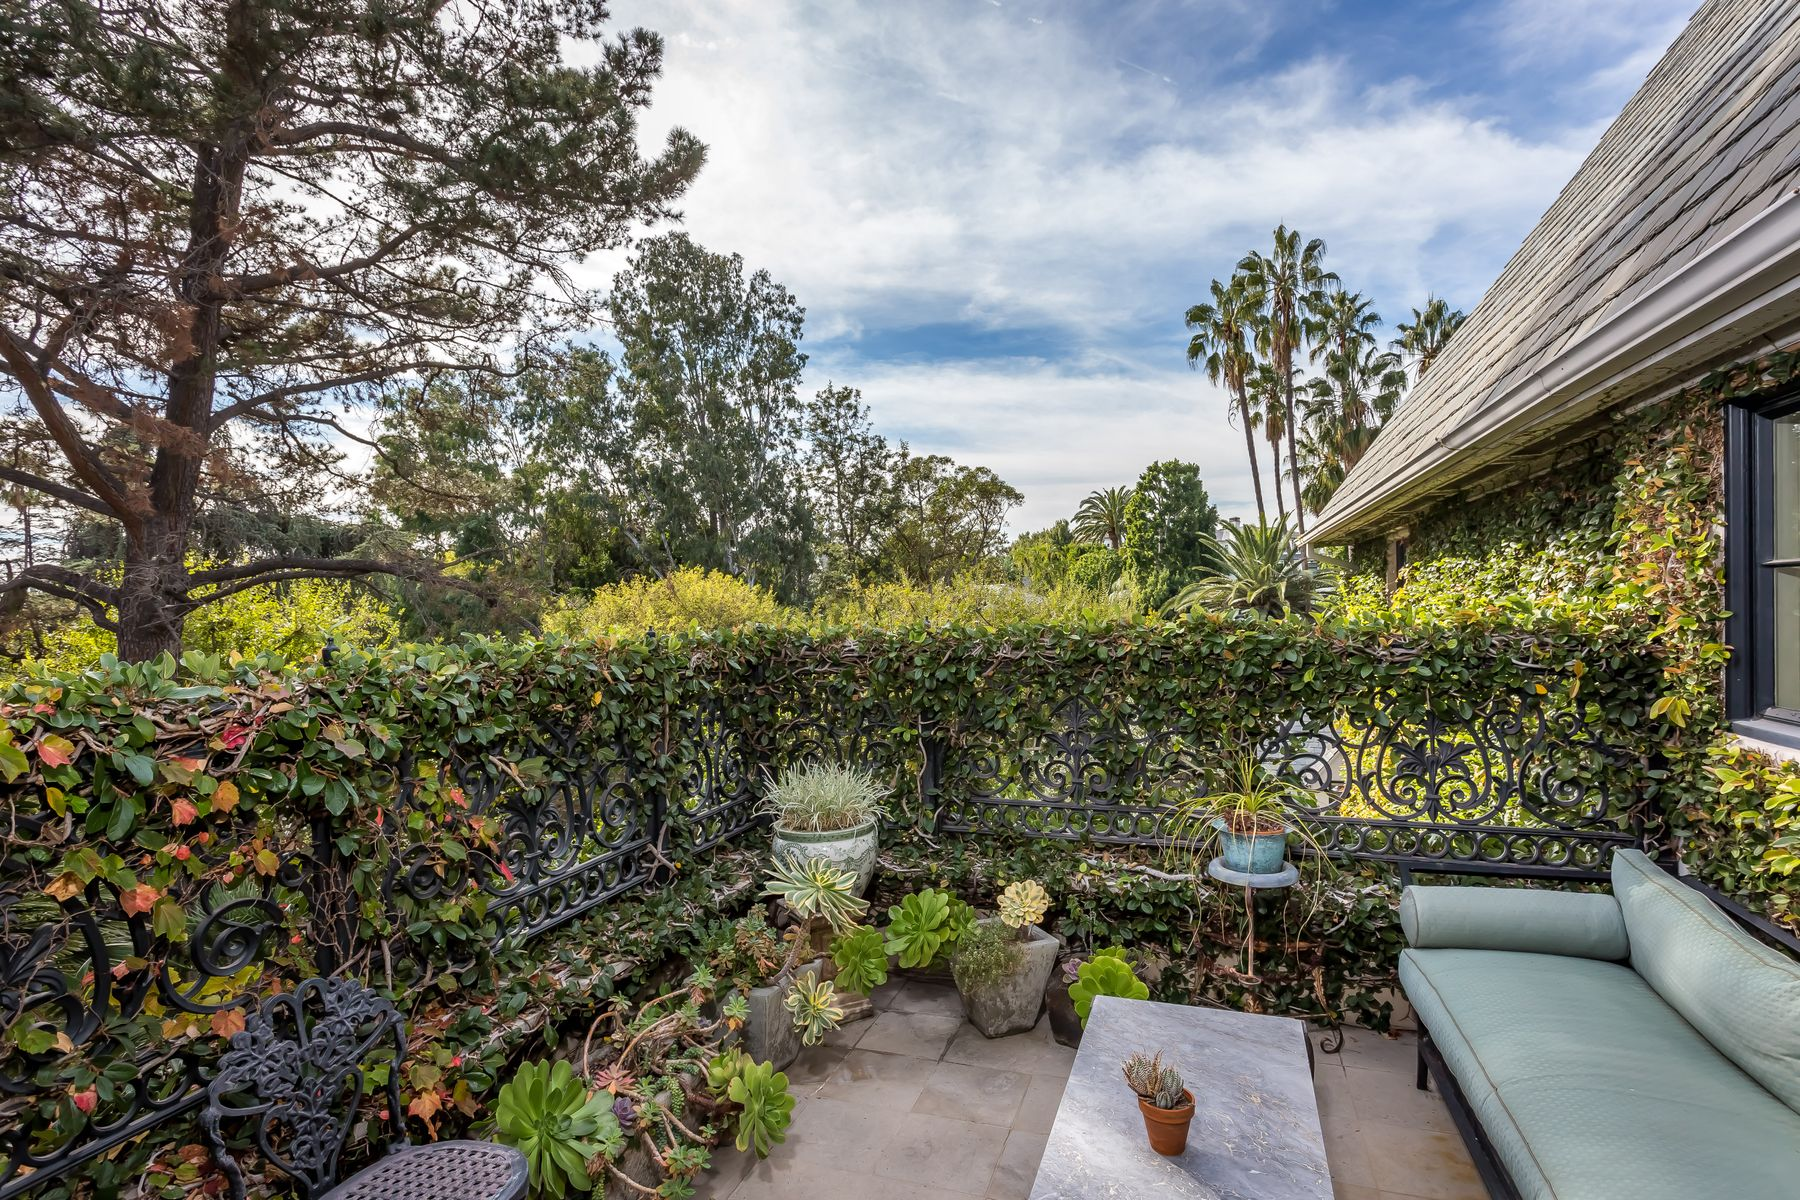 Additional photo for property listing at Legendary Prime Holmby Hills Estate 255 Ladera Drive 比佛利山庄, 加利福尼亚州 90210 美国